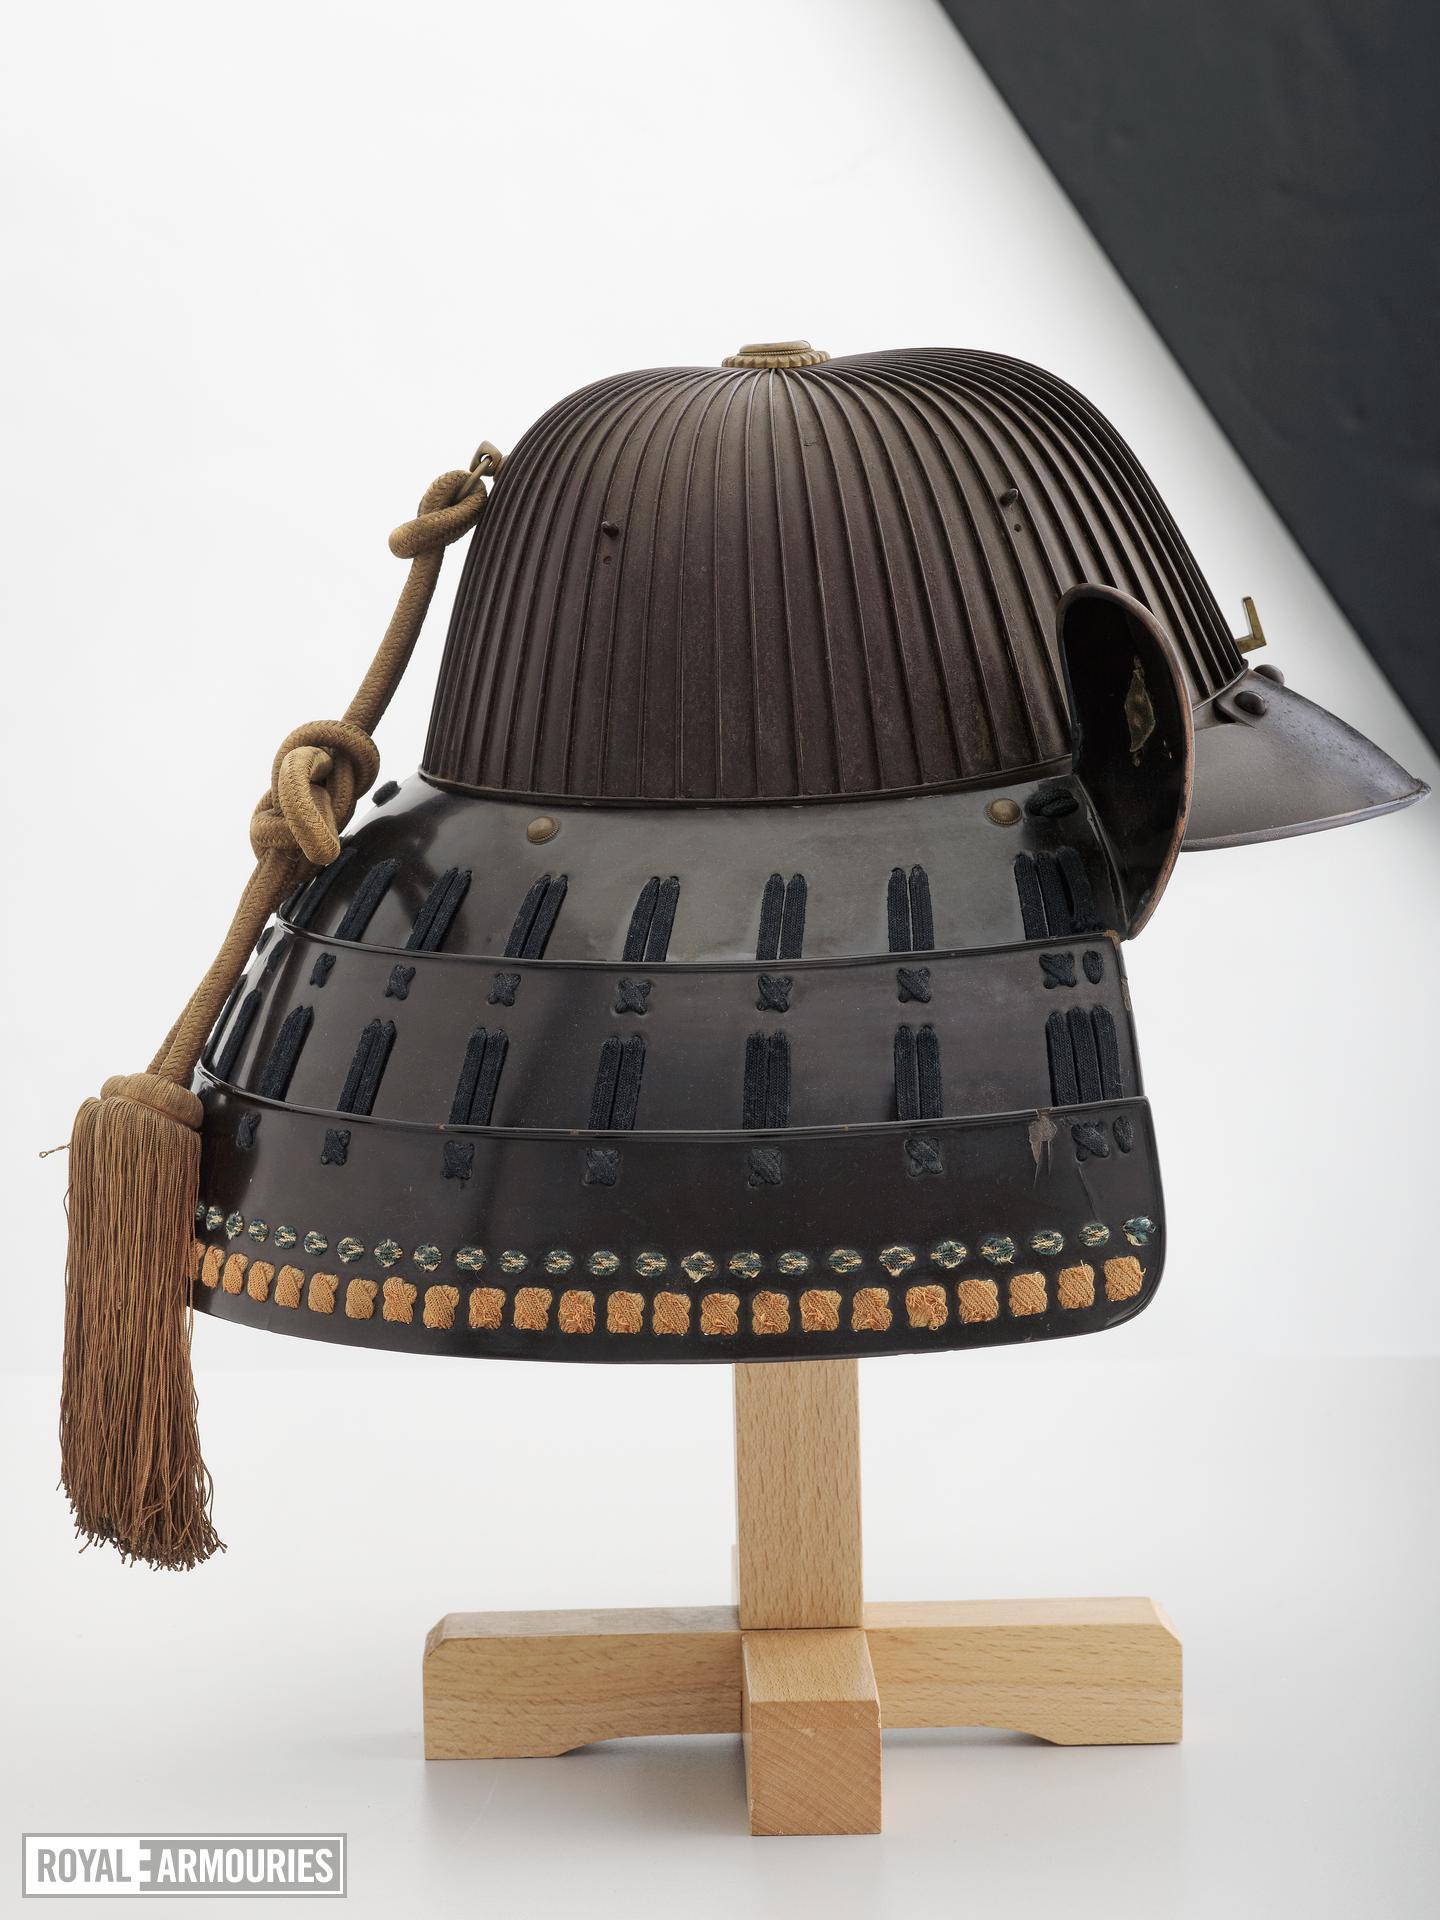 Helmet (suji kabuto)